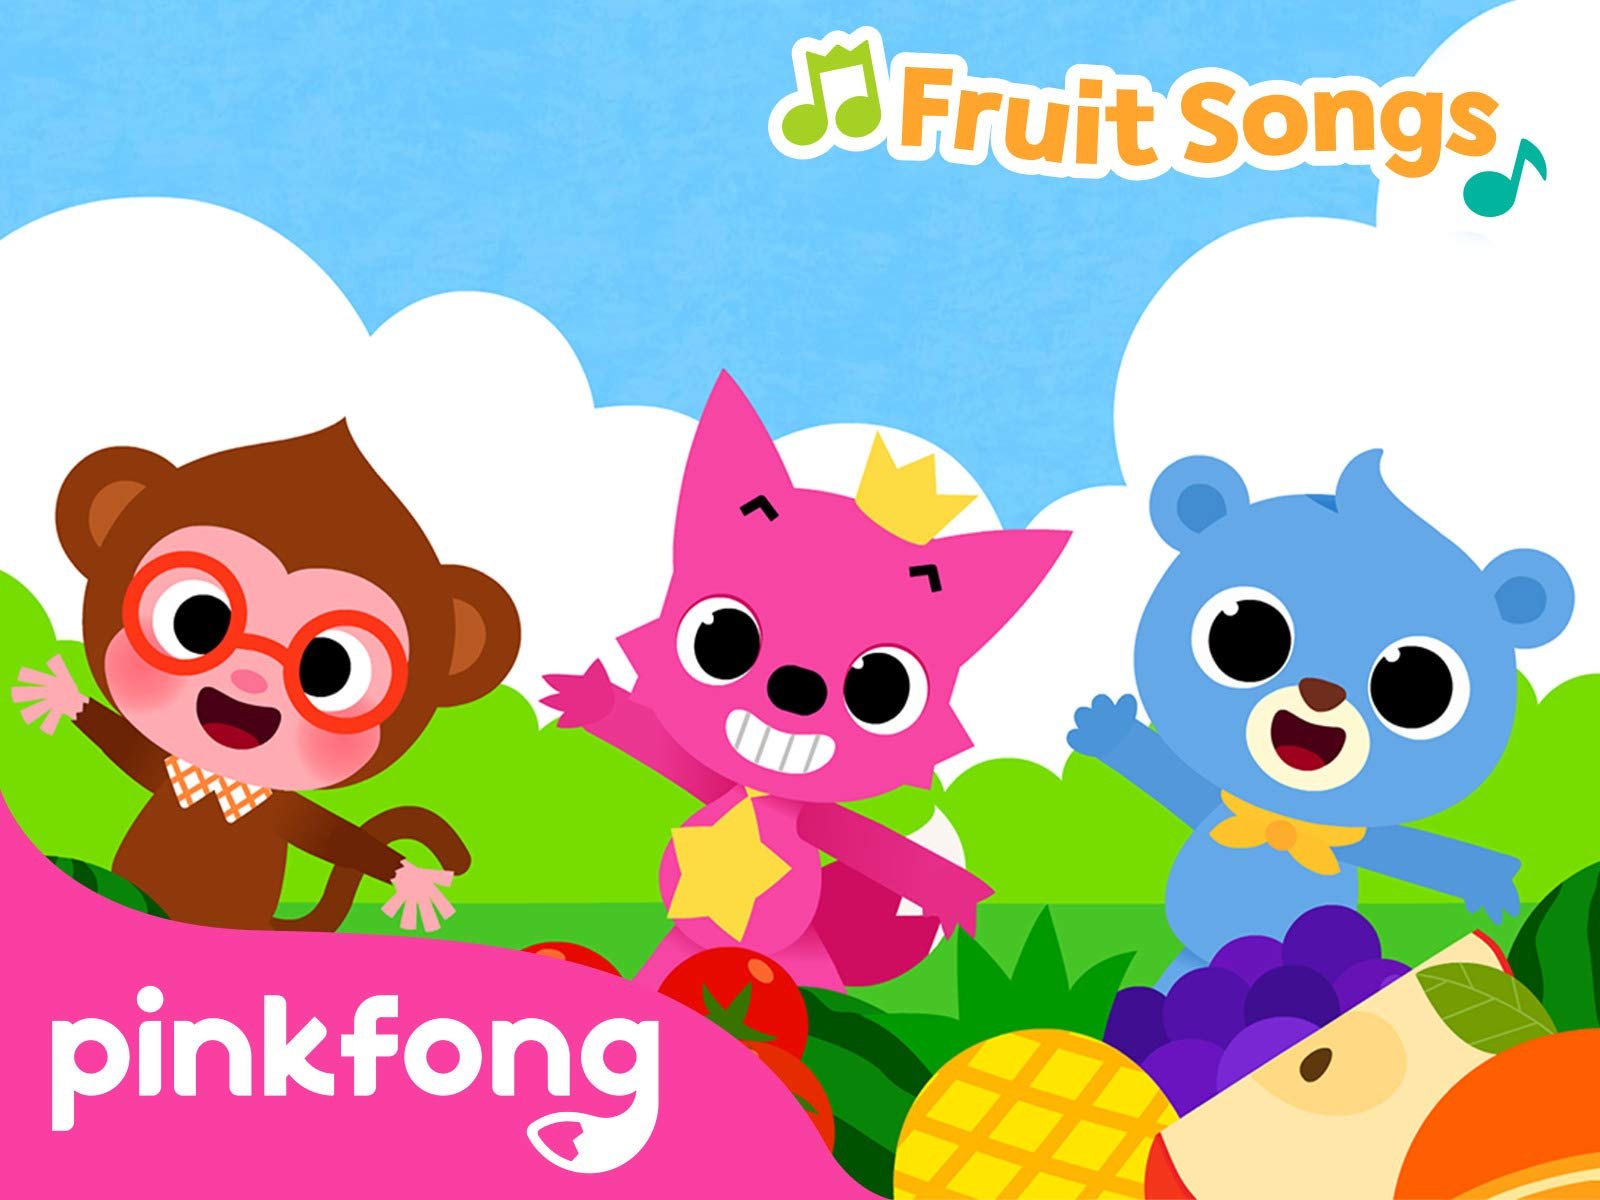 Pinkfong! Fruit Songs